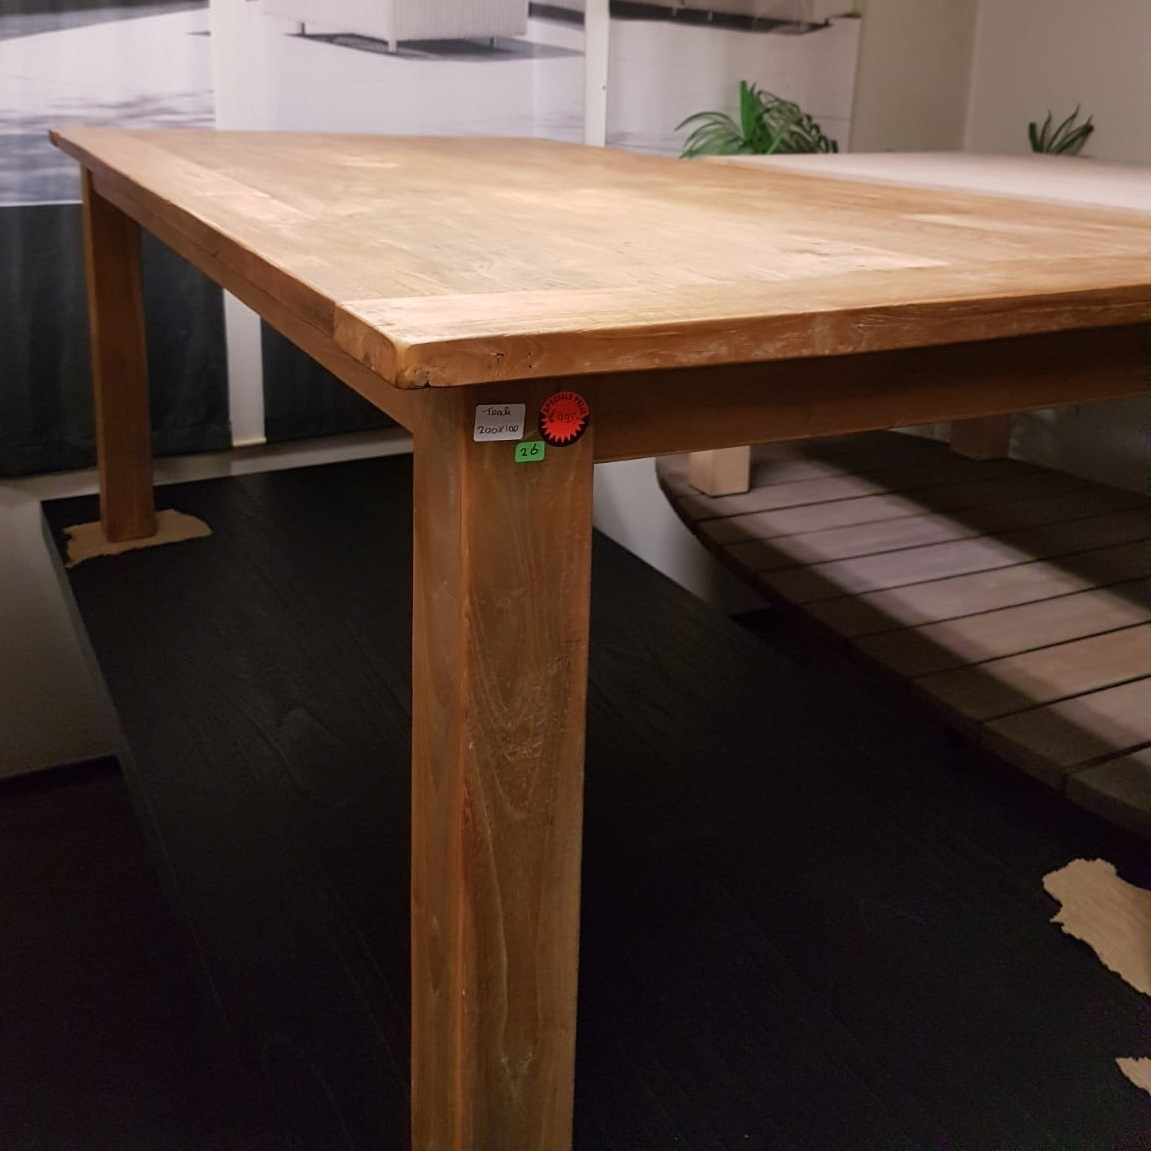 showmodel-oude-teaktafel-200-cm-teakhout-stoer-robuust-warm-hardhout